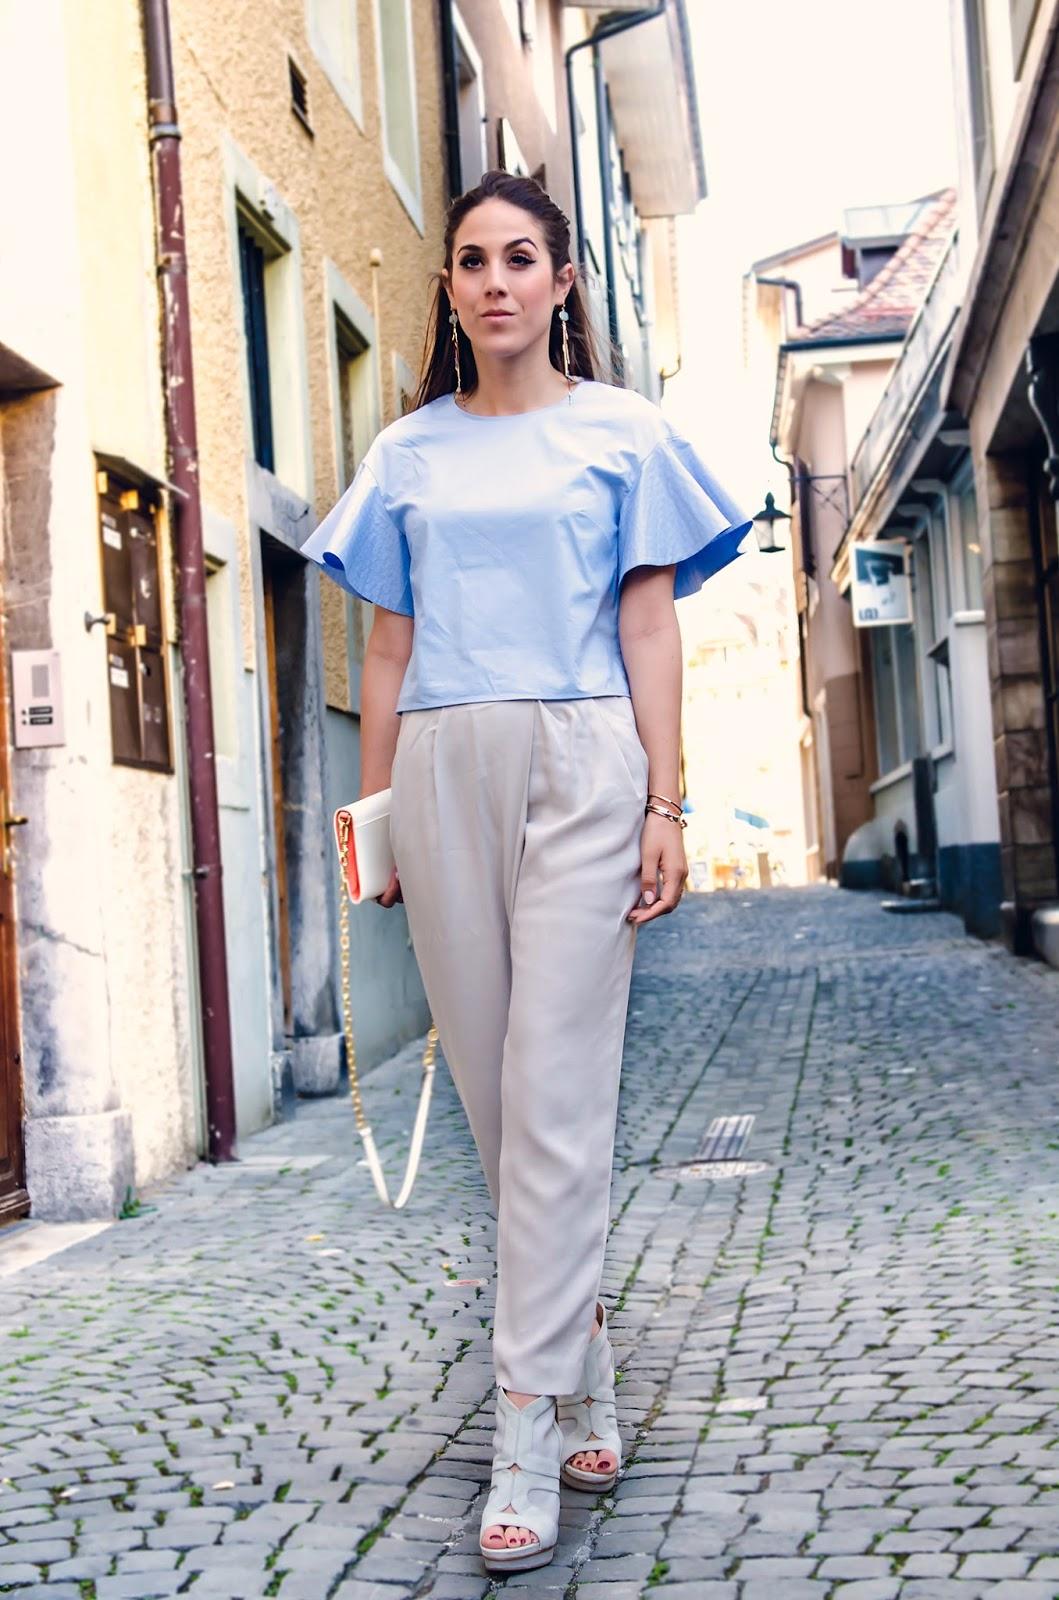 alison liaudat, beauty blogger swiss, blog mode suisee, fashion blogger Switzerland, Outfit, swiss blogger, swiss fashion blogger